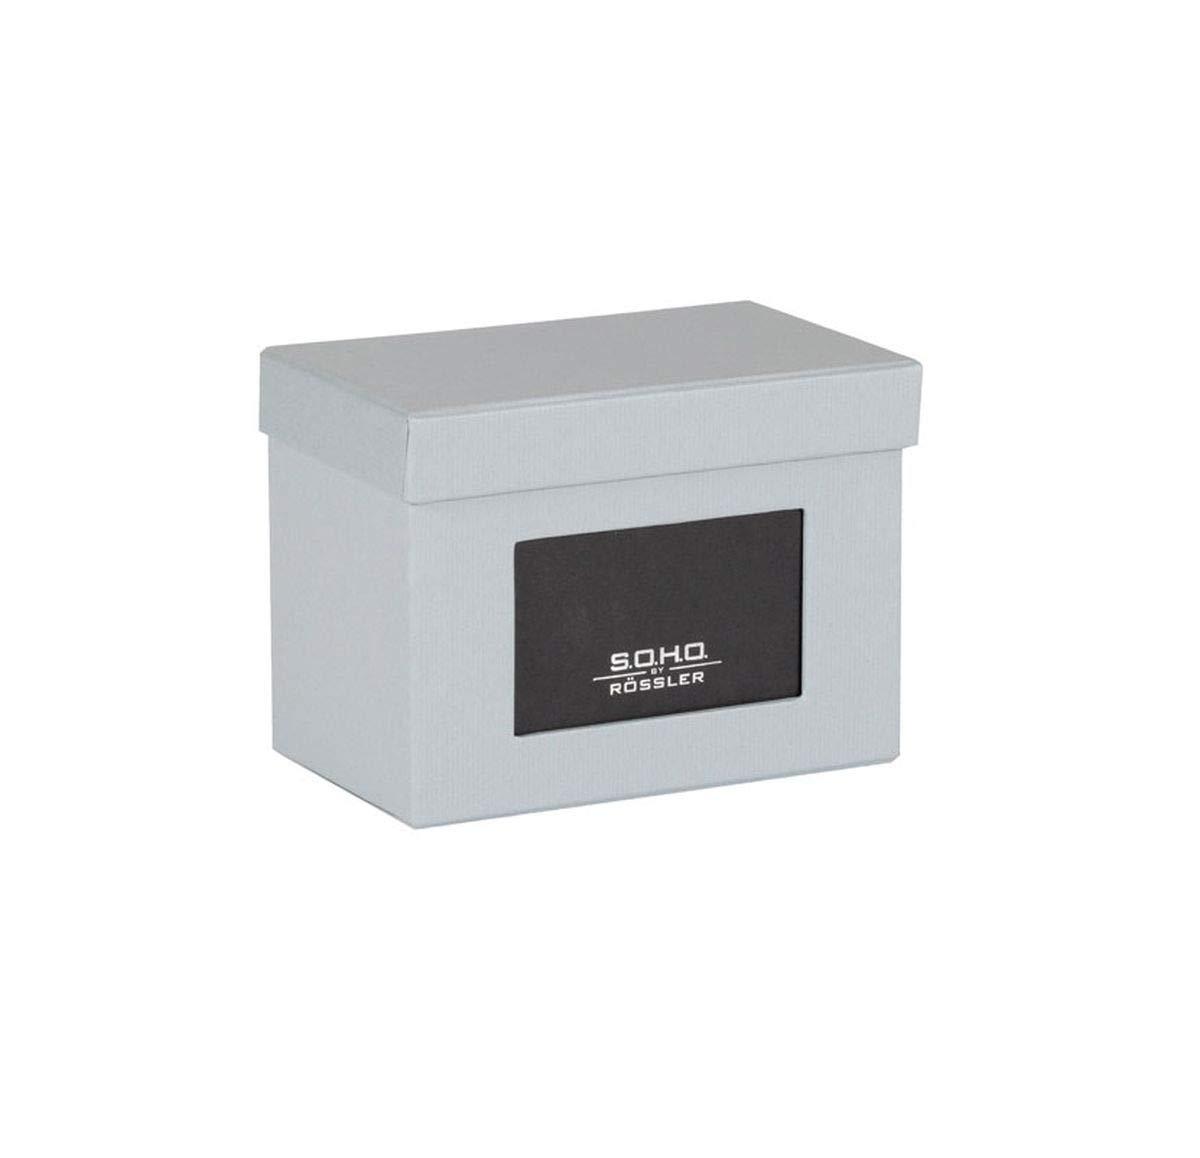 Rössler SOHO - Archivador para Fotos con Compartimento para Etiqueta, 16.5 x 10 x 12.5 cm, color gris